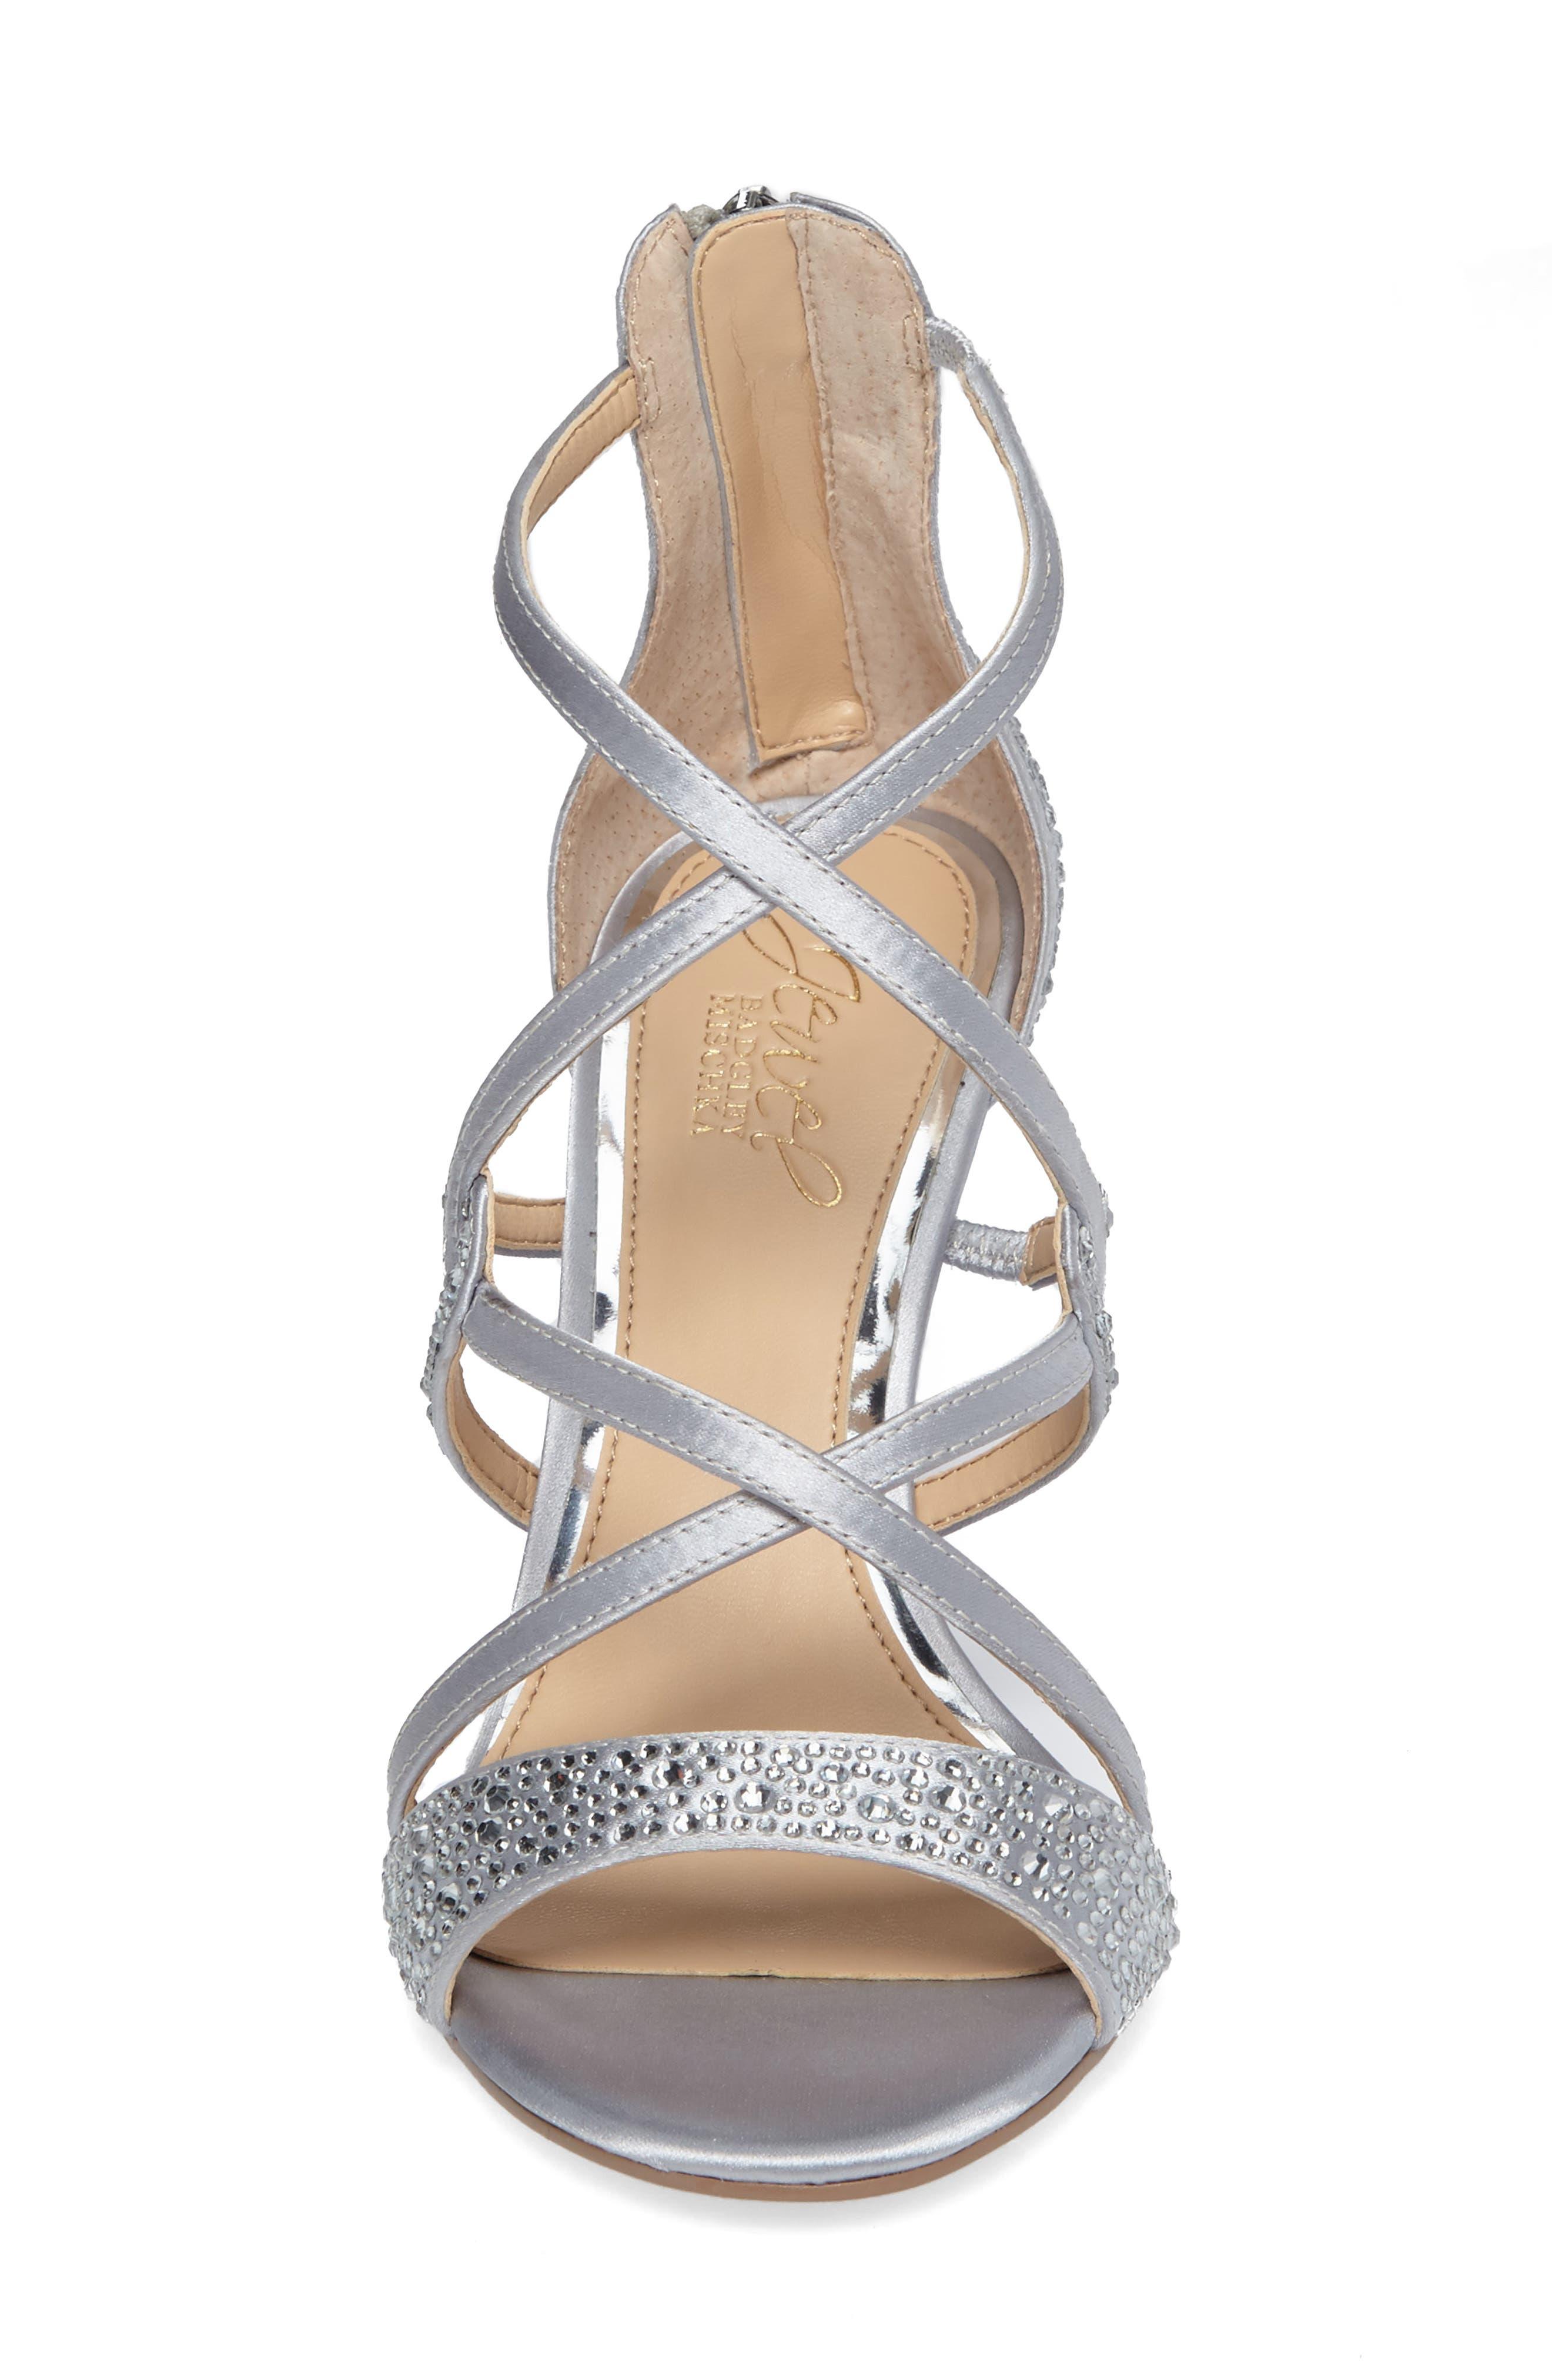 Ally II Embellished Wedge Sandal,                             Alternate thumbnail 4, color,                             Silver Satin